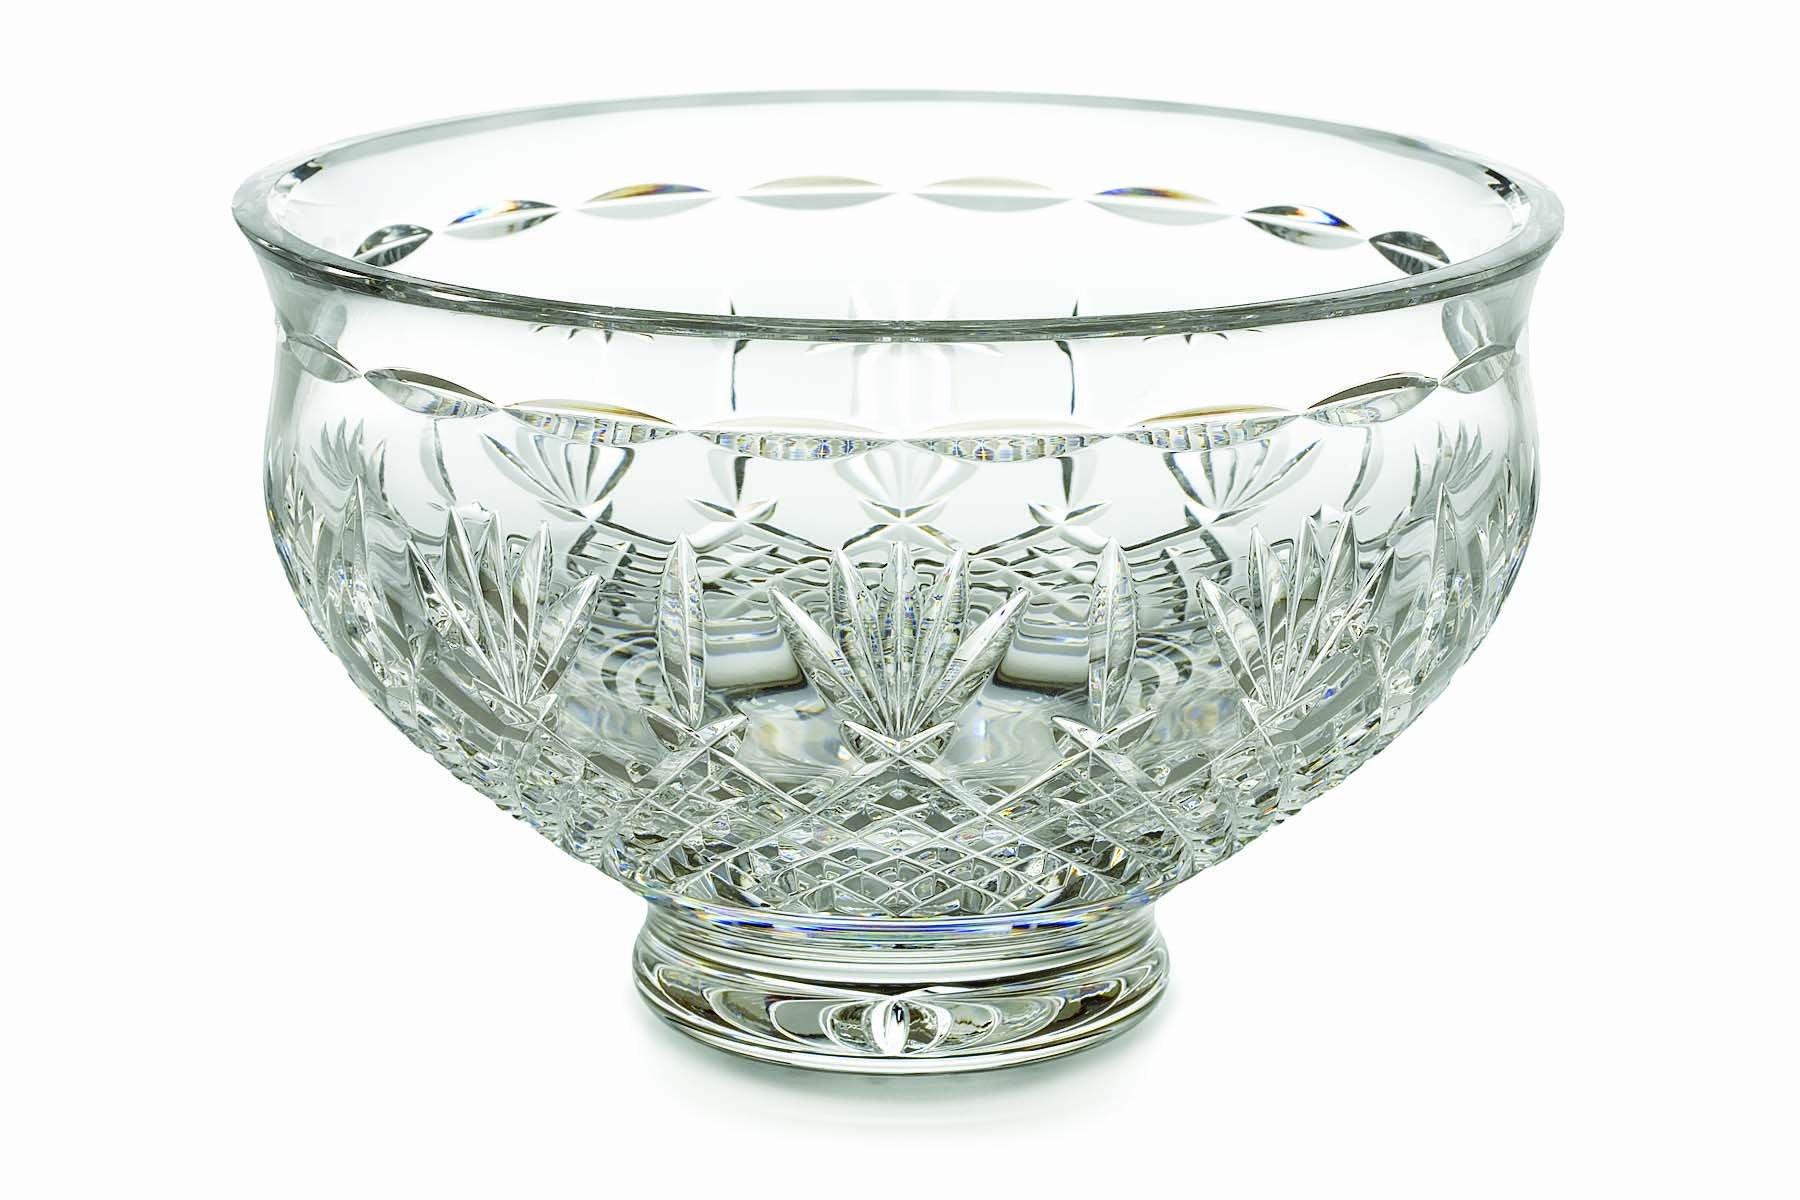 Waterford Killarney 10-Inch Bowl